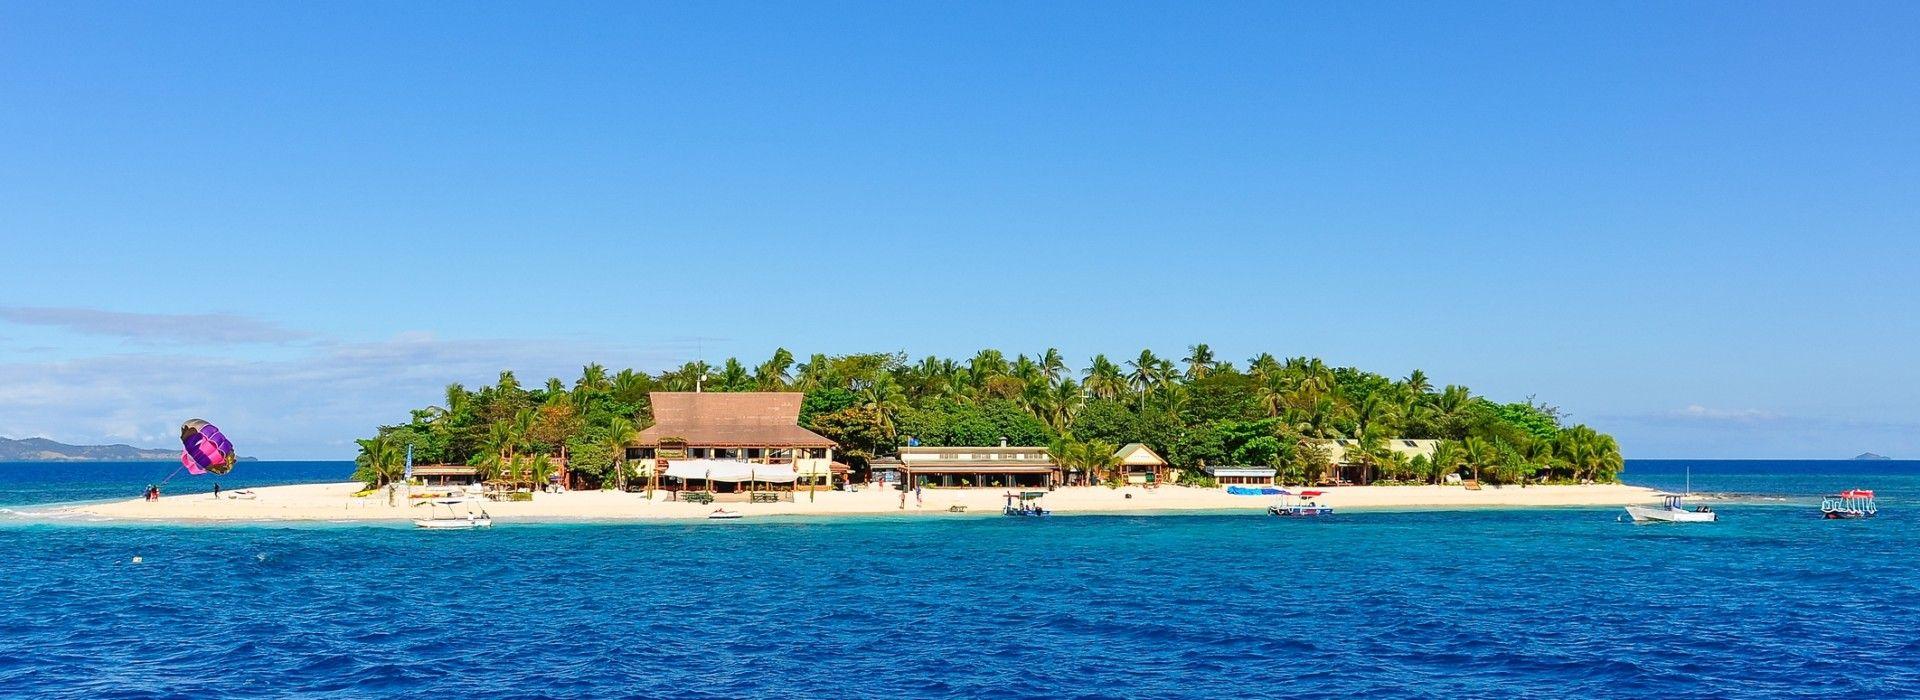 Adventure and sport activities Tours in Oceania